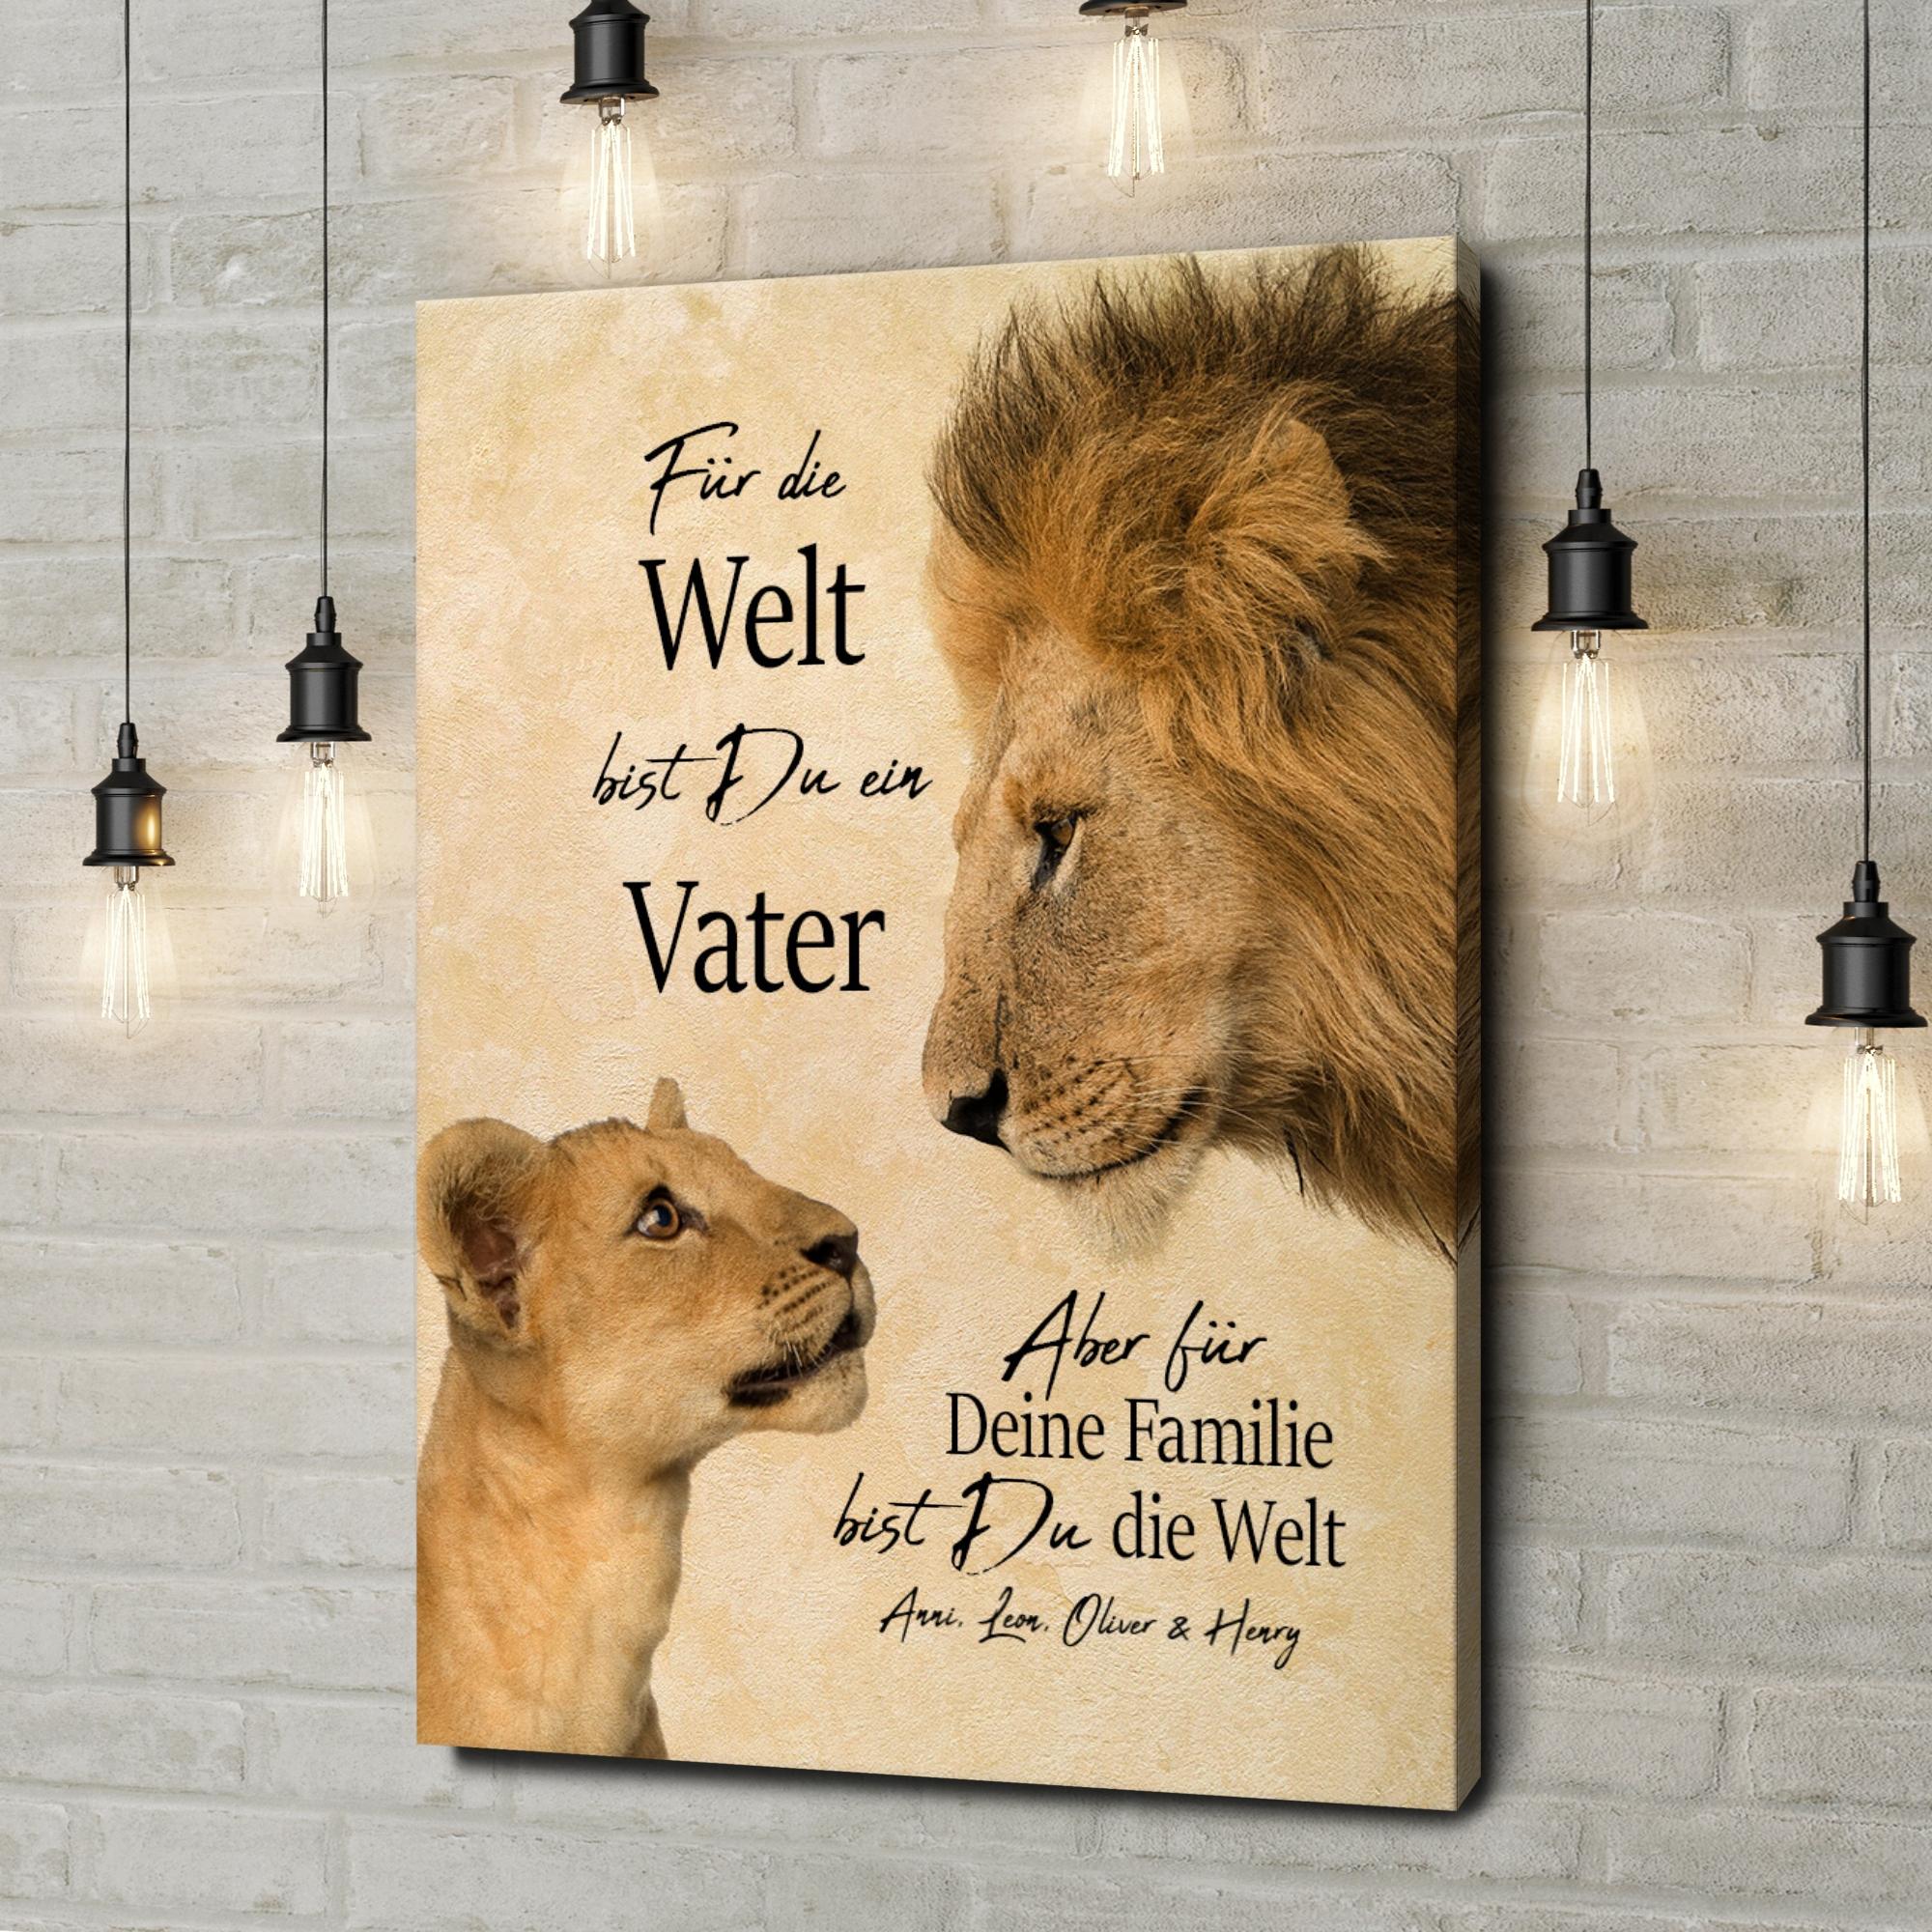 Leinwandbild personalisiert Löwenvater 2